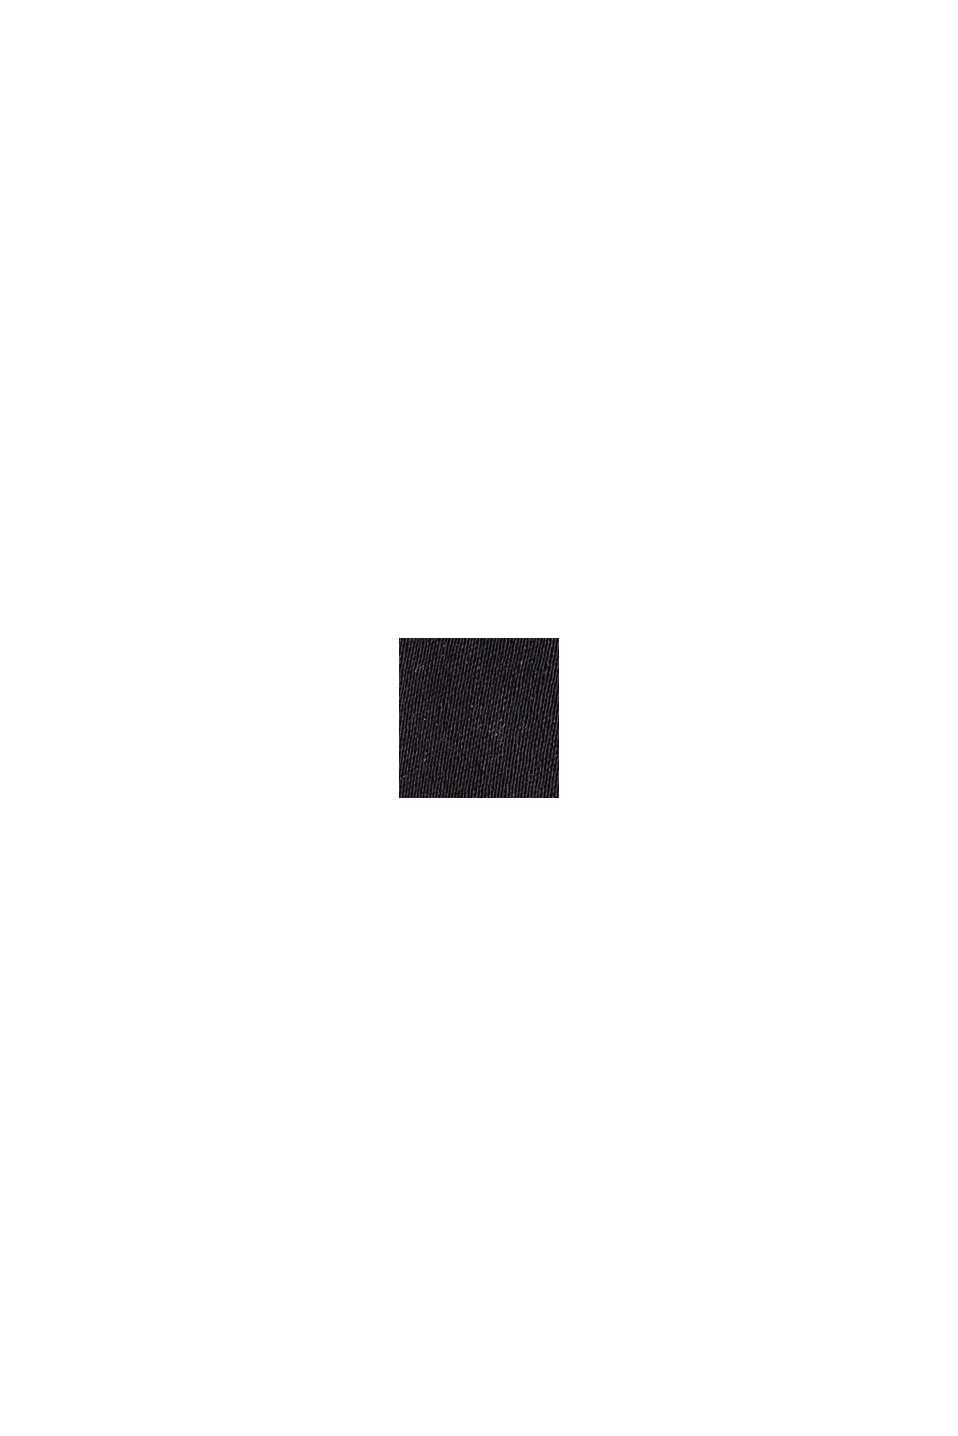 Jean noir en matière jogging confortable, BLACK DARK WASHED, swatch